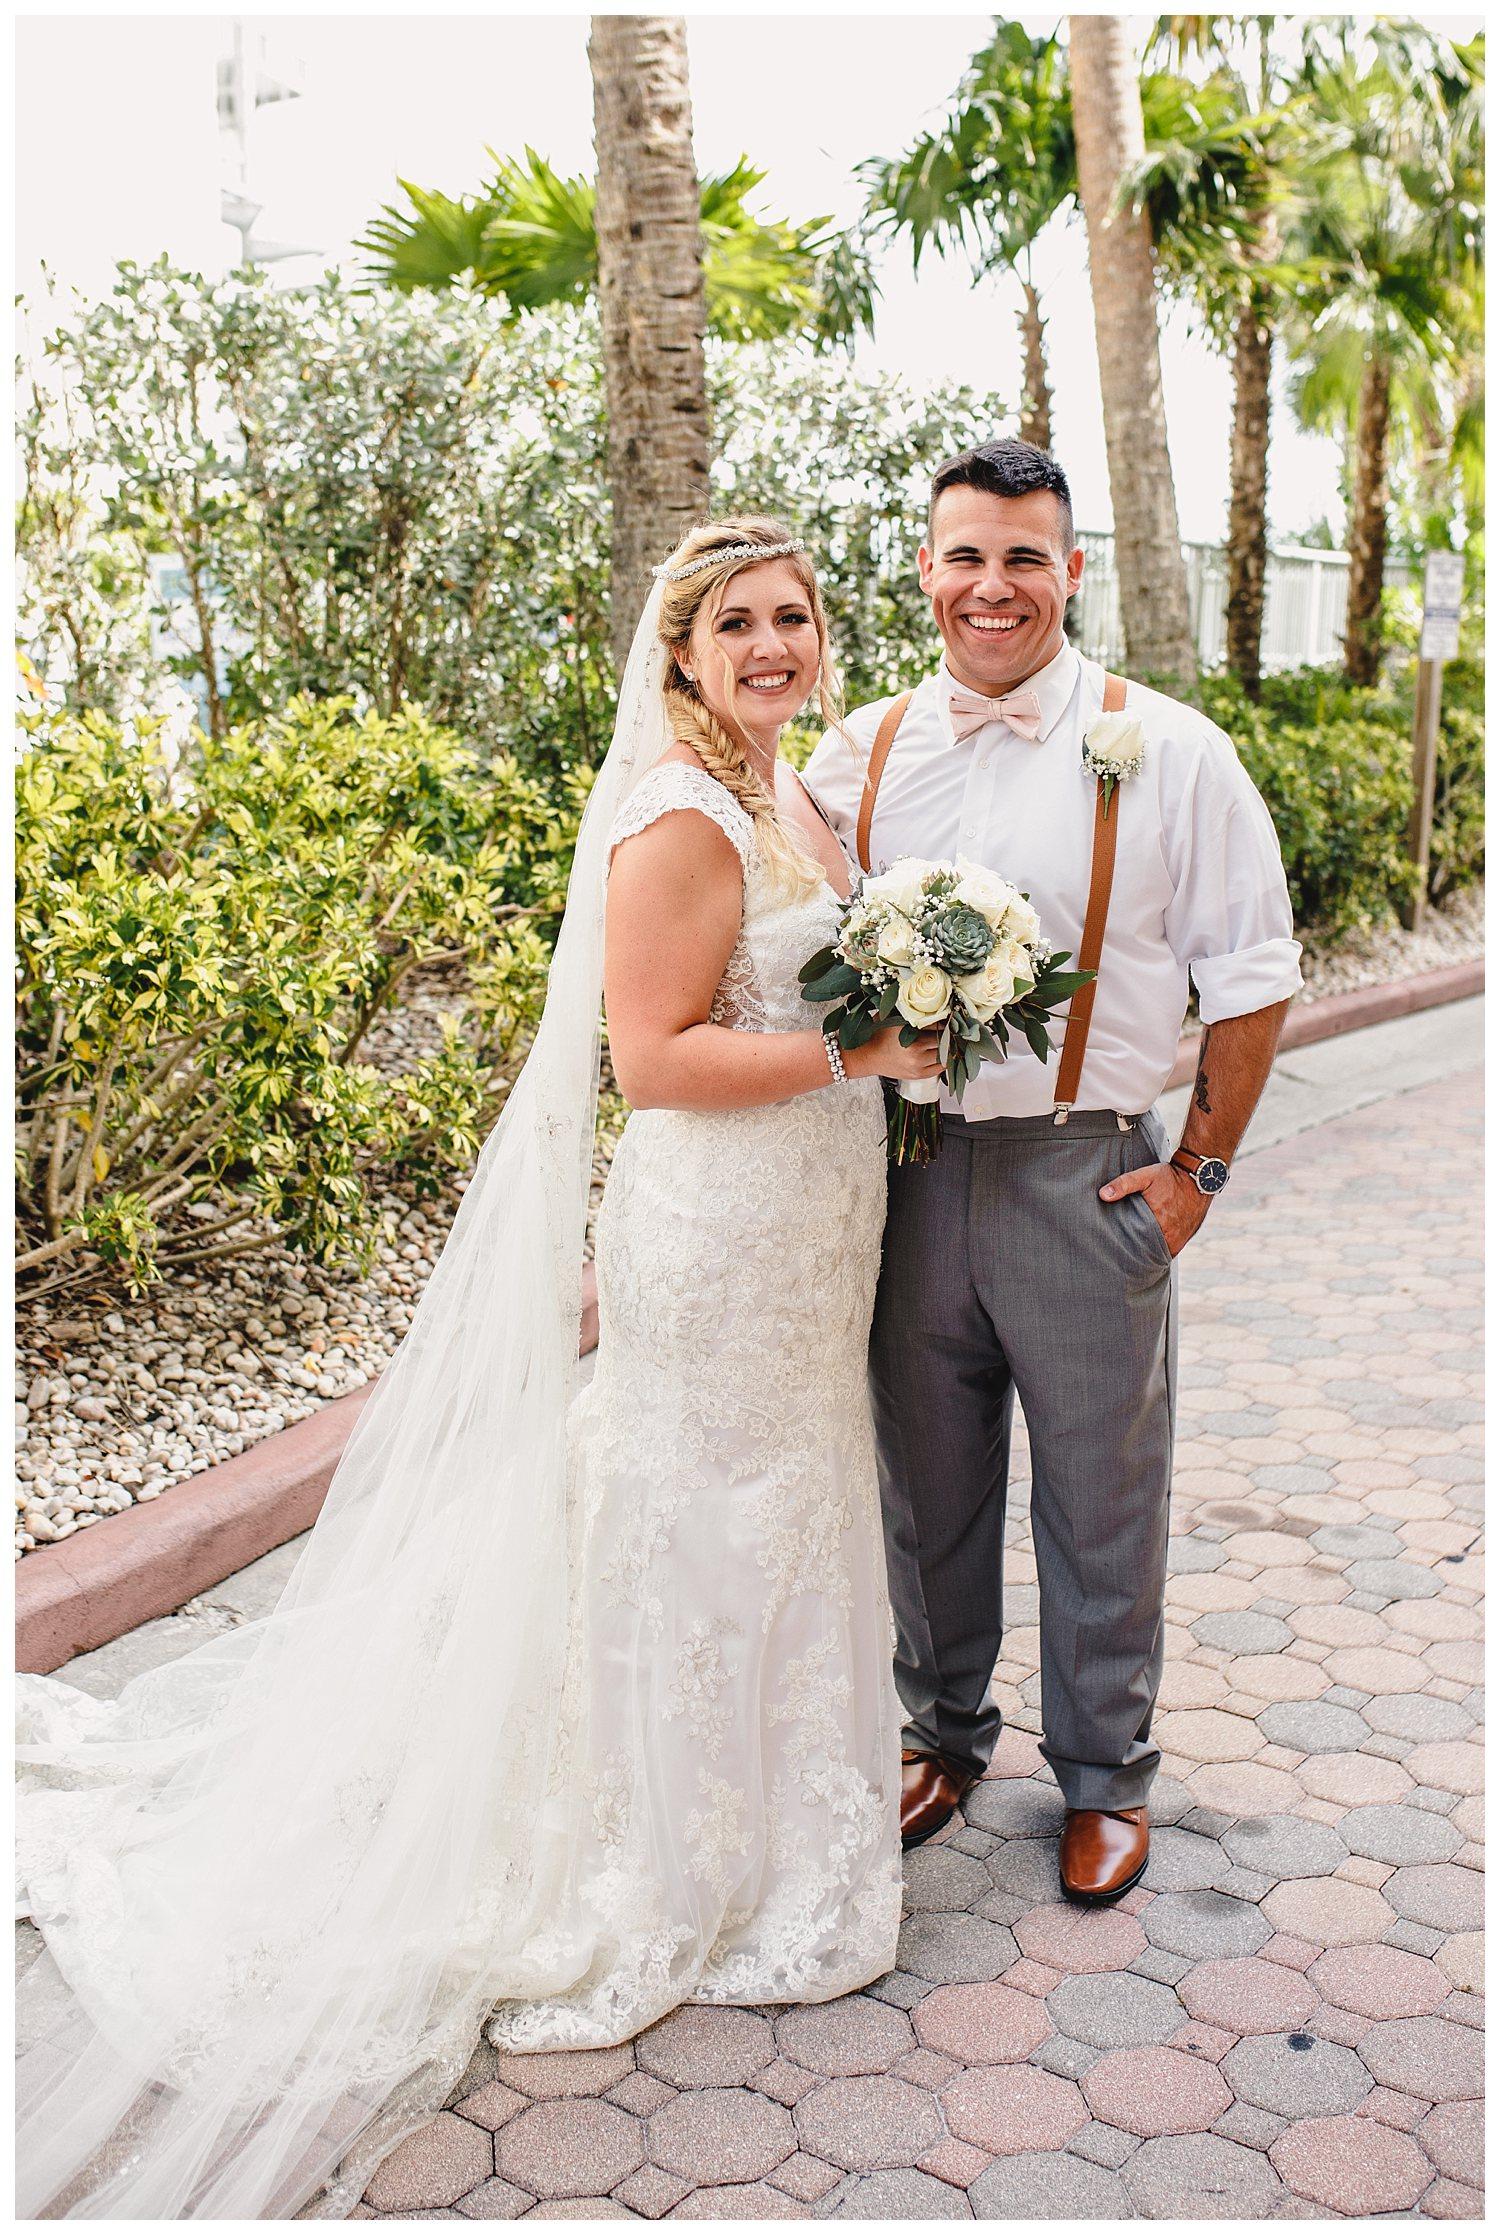 Kelsey_Diane_Photography_Destination_Wedding_Sarasota_Florida_Beach_Wedding_Alex_Austin_0636.jpg